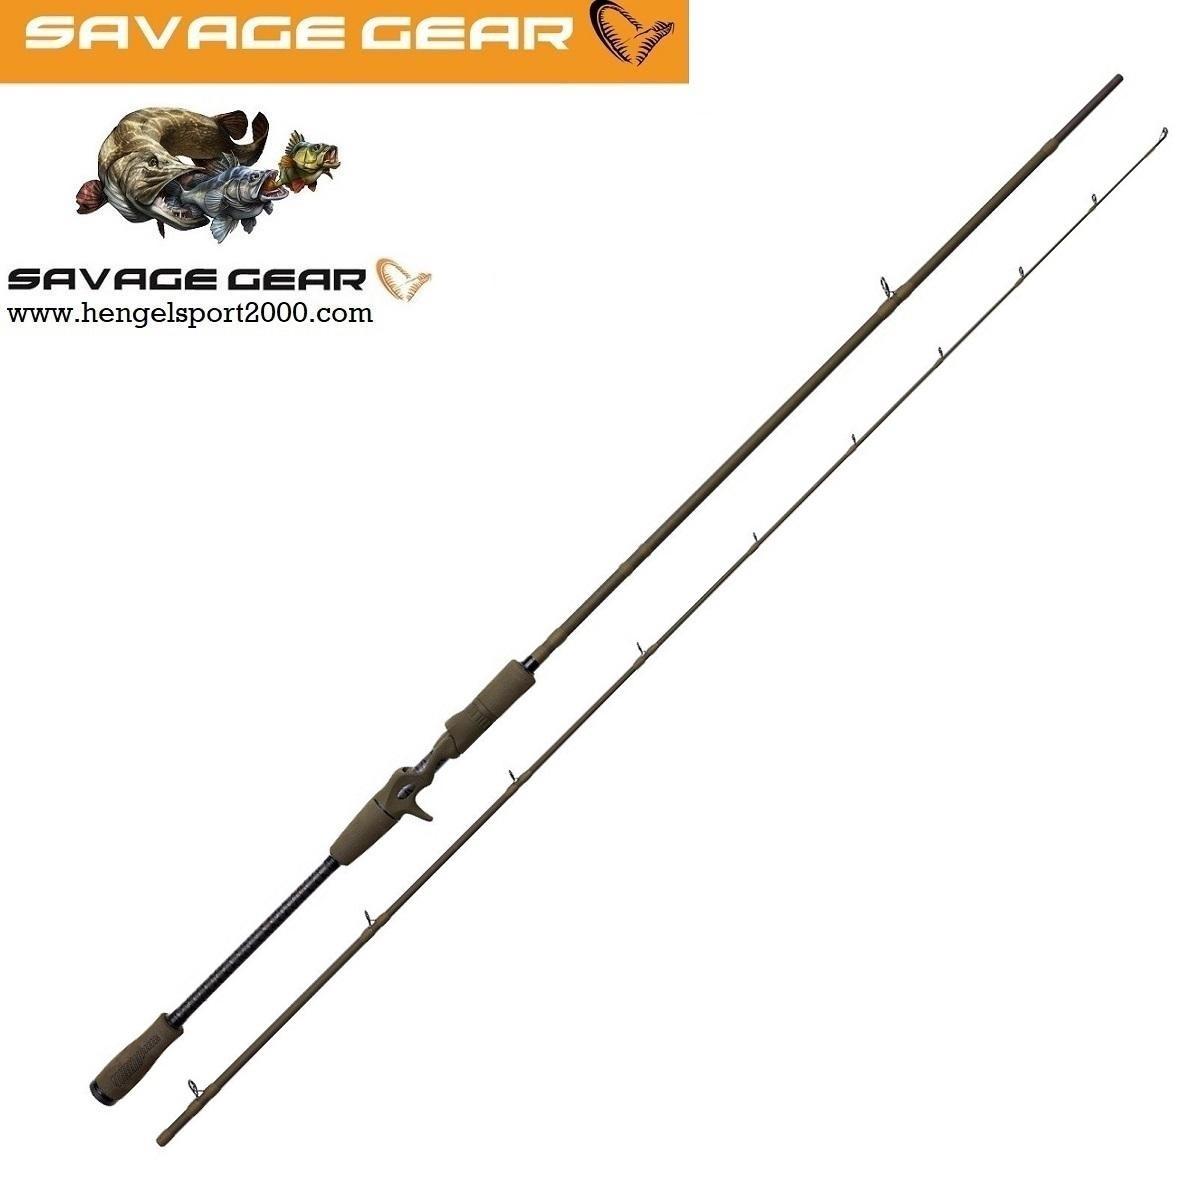 Savage Gear SG4 Power Game Trigger 259 cm 80 - 130 gram